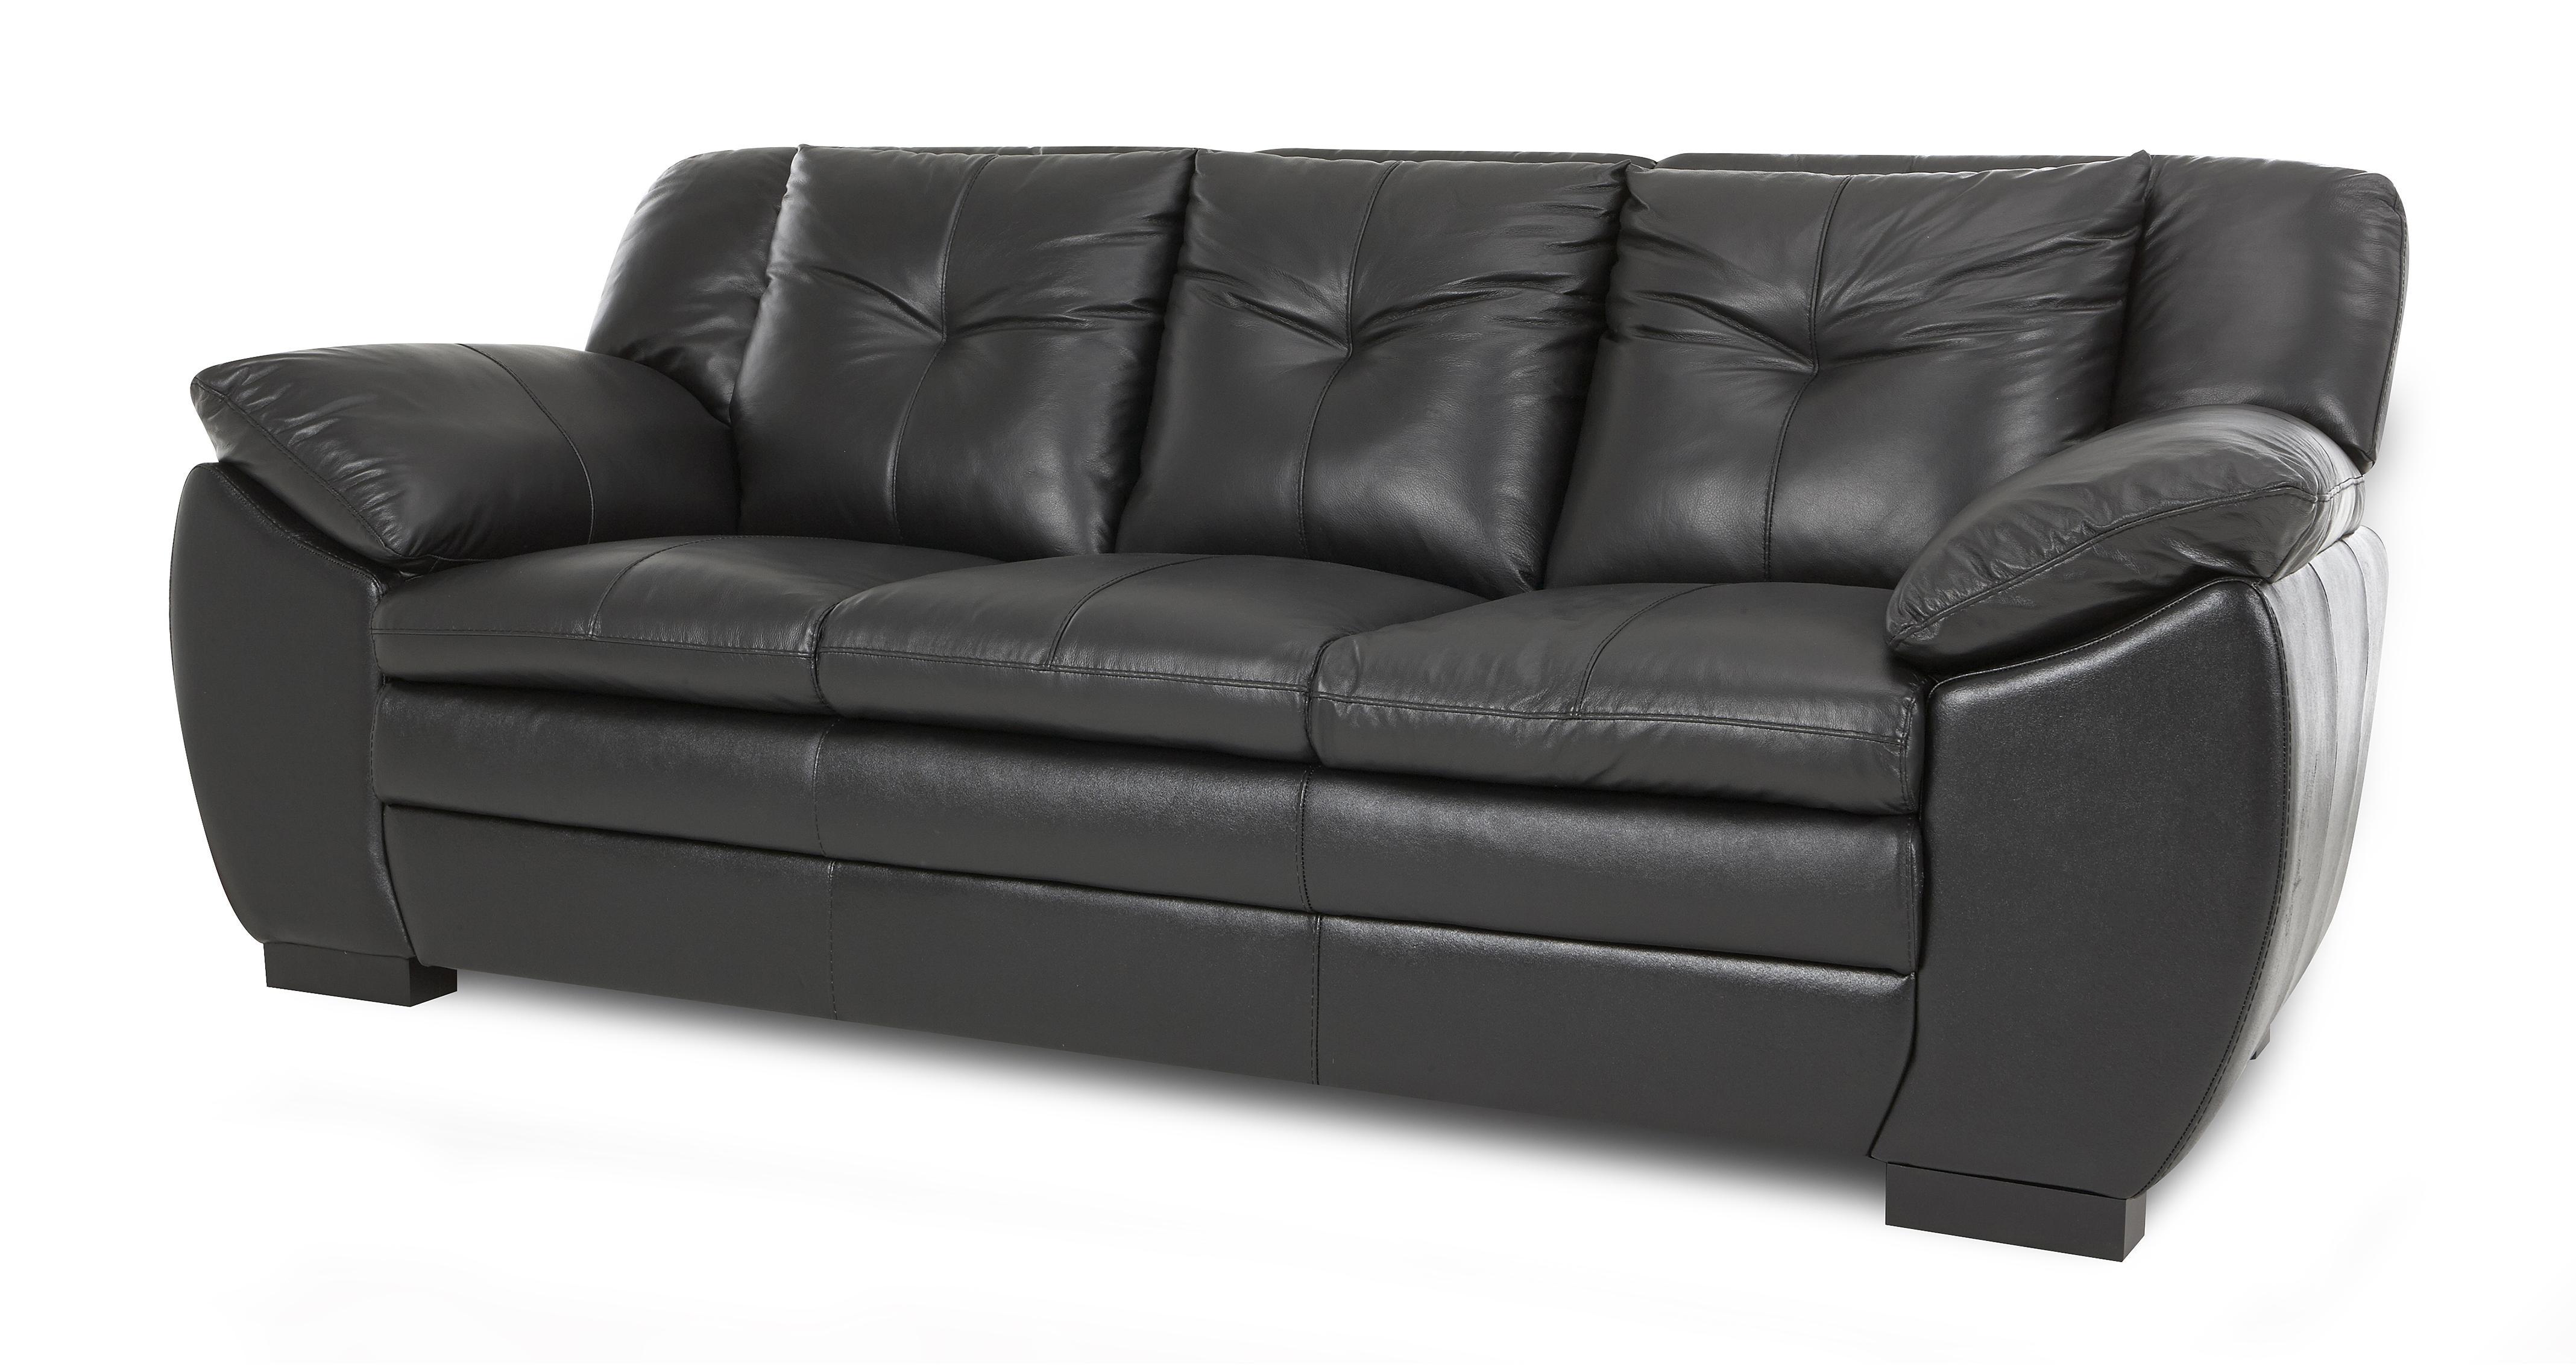 3 seater leather sofa dfs sofas on a budget warrant black ebay